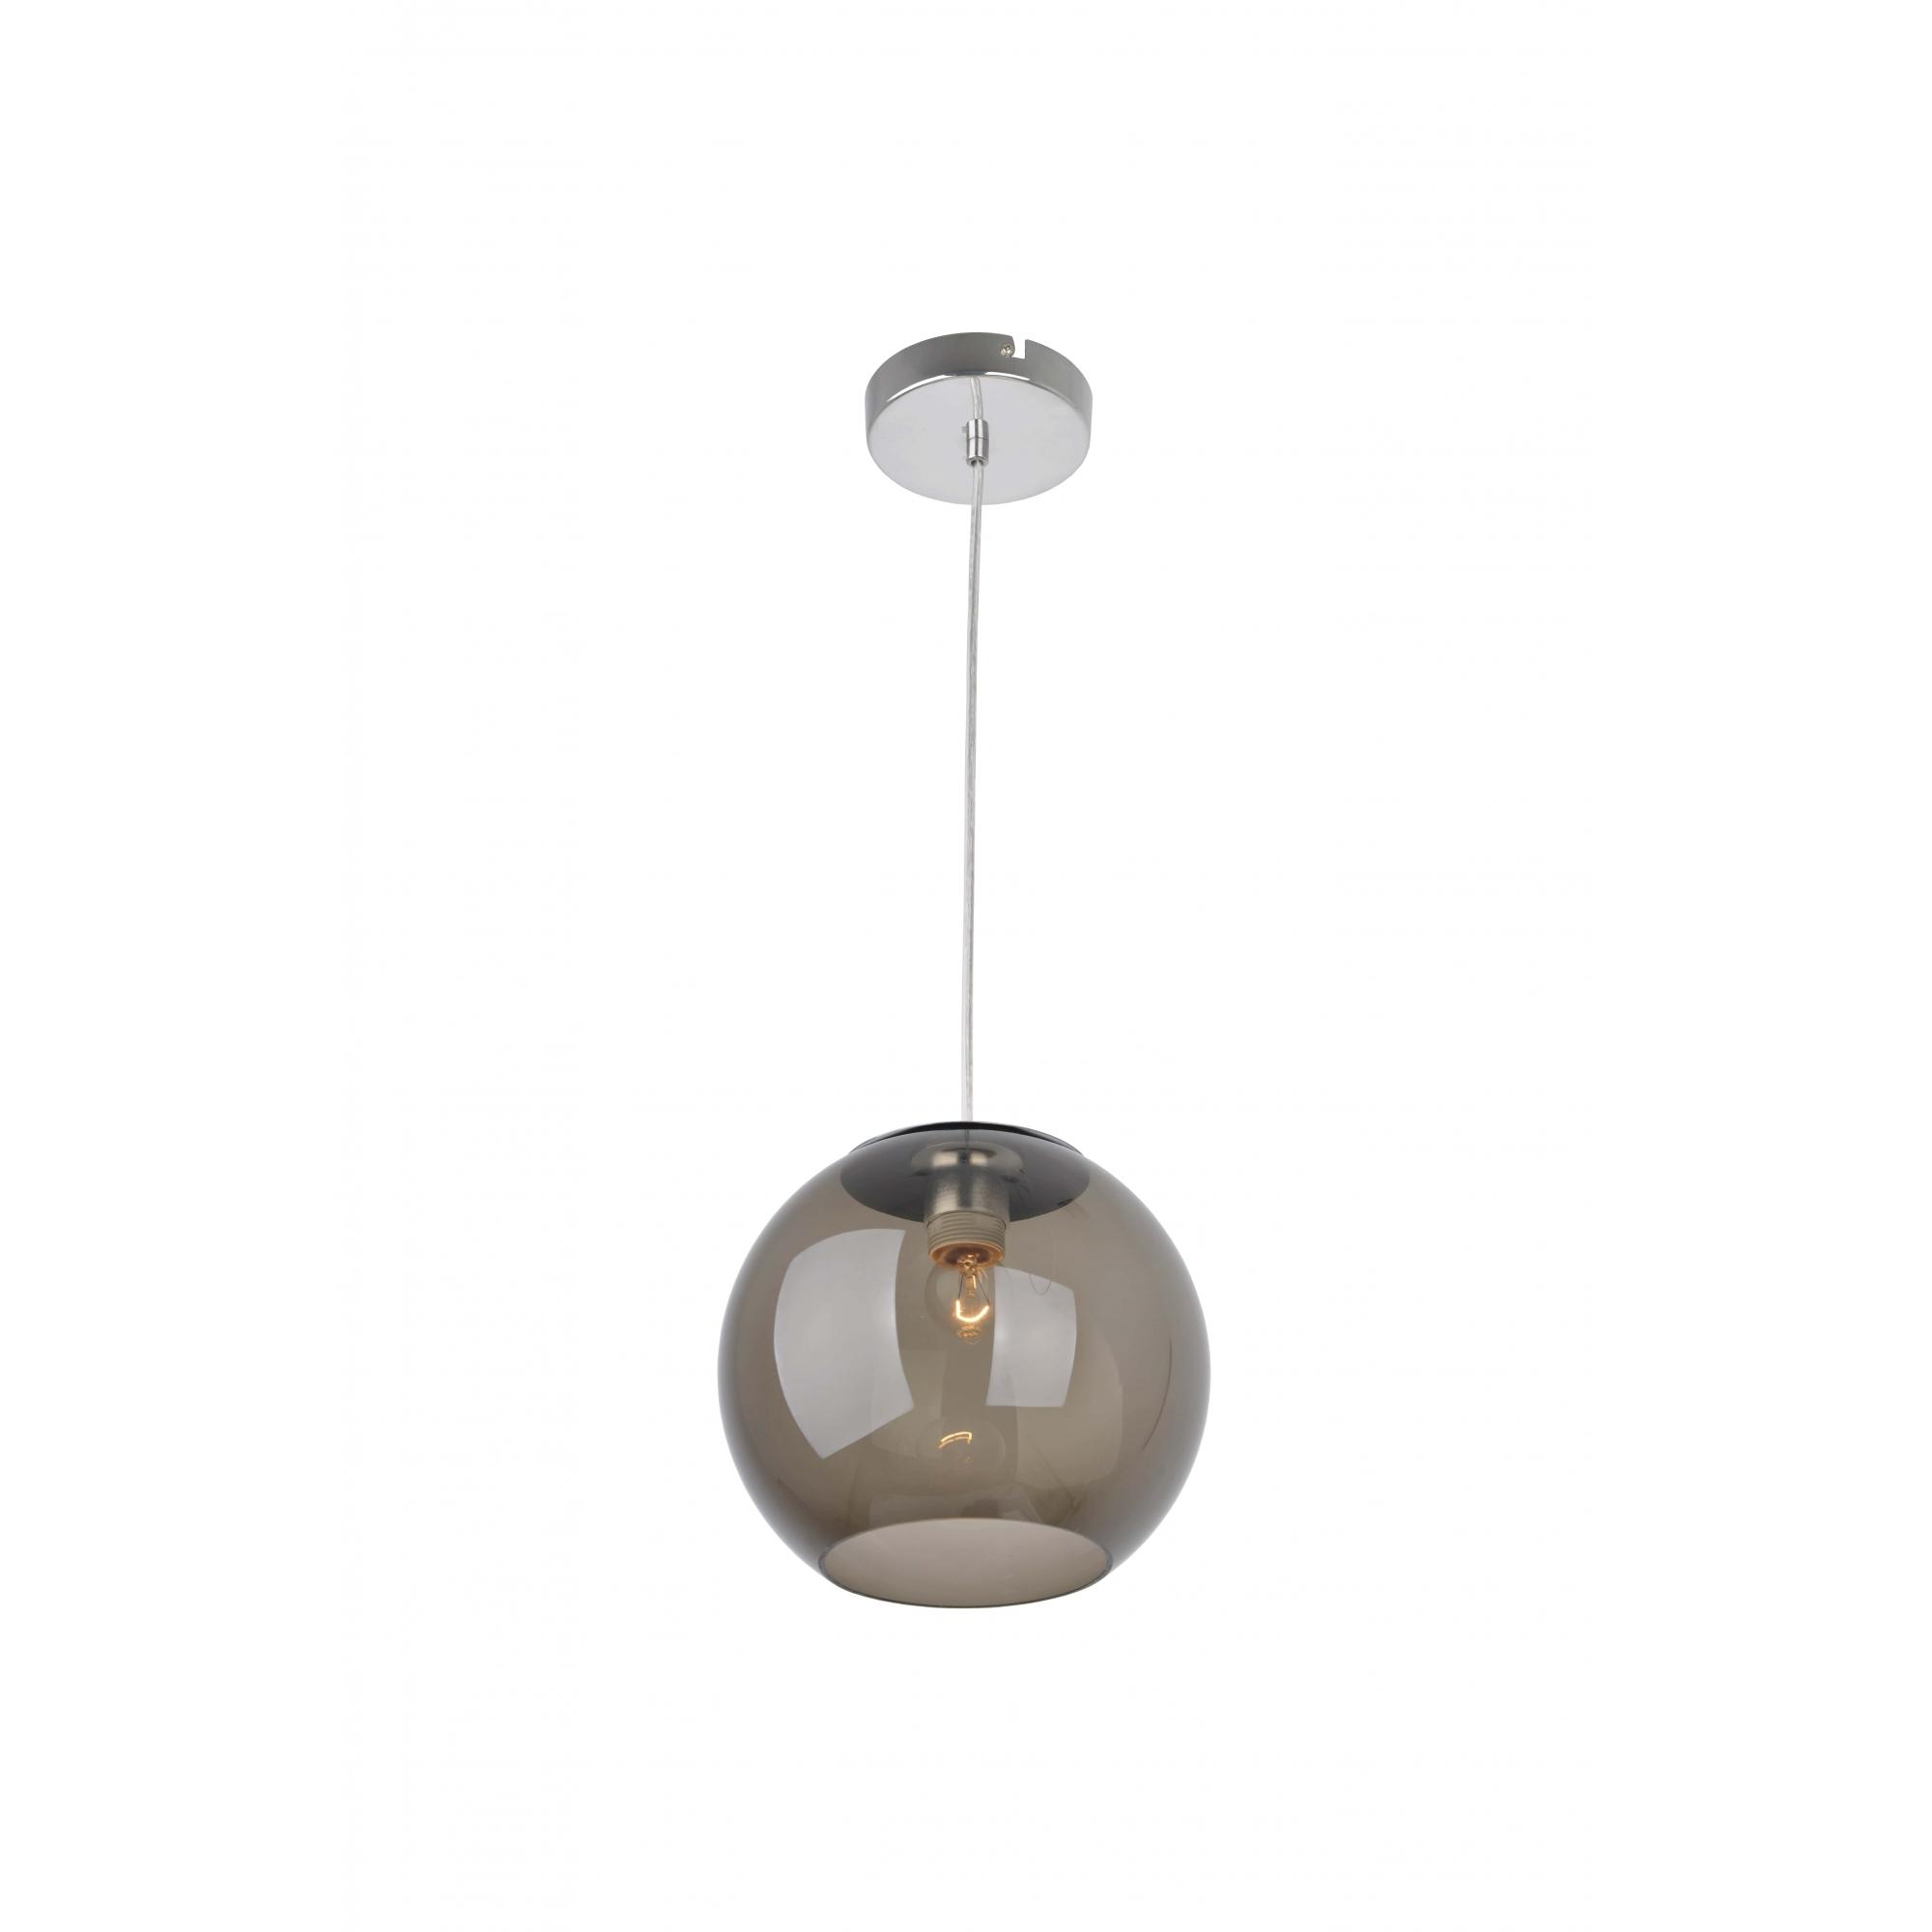 Bronzearte Pendente Globe Acrilico Fume 25cm